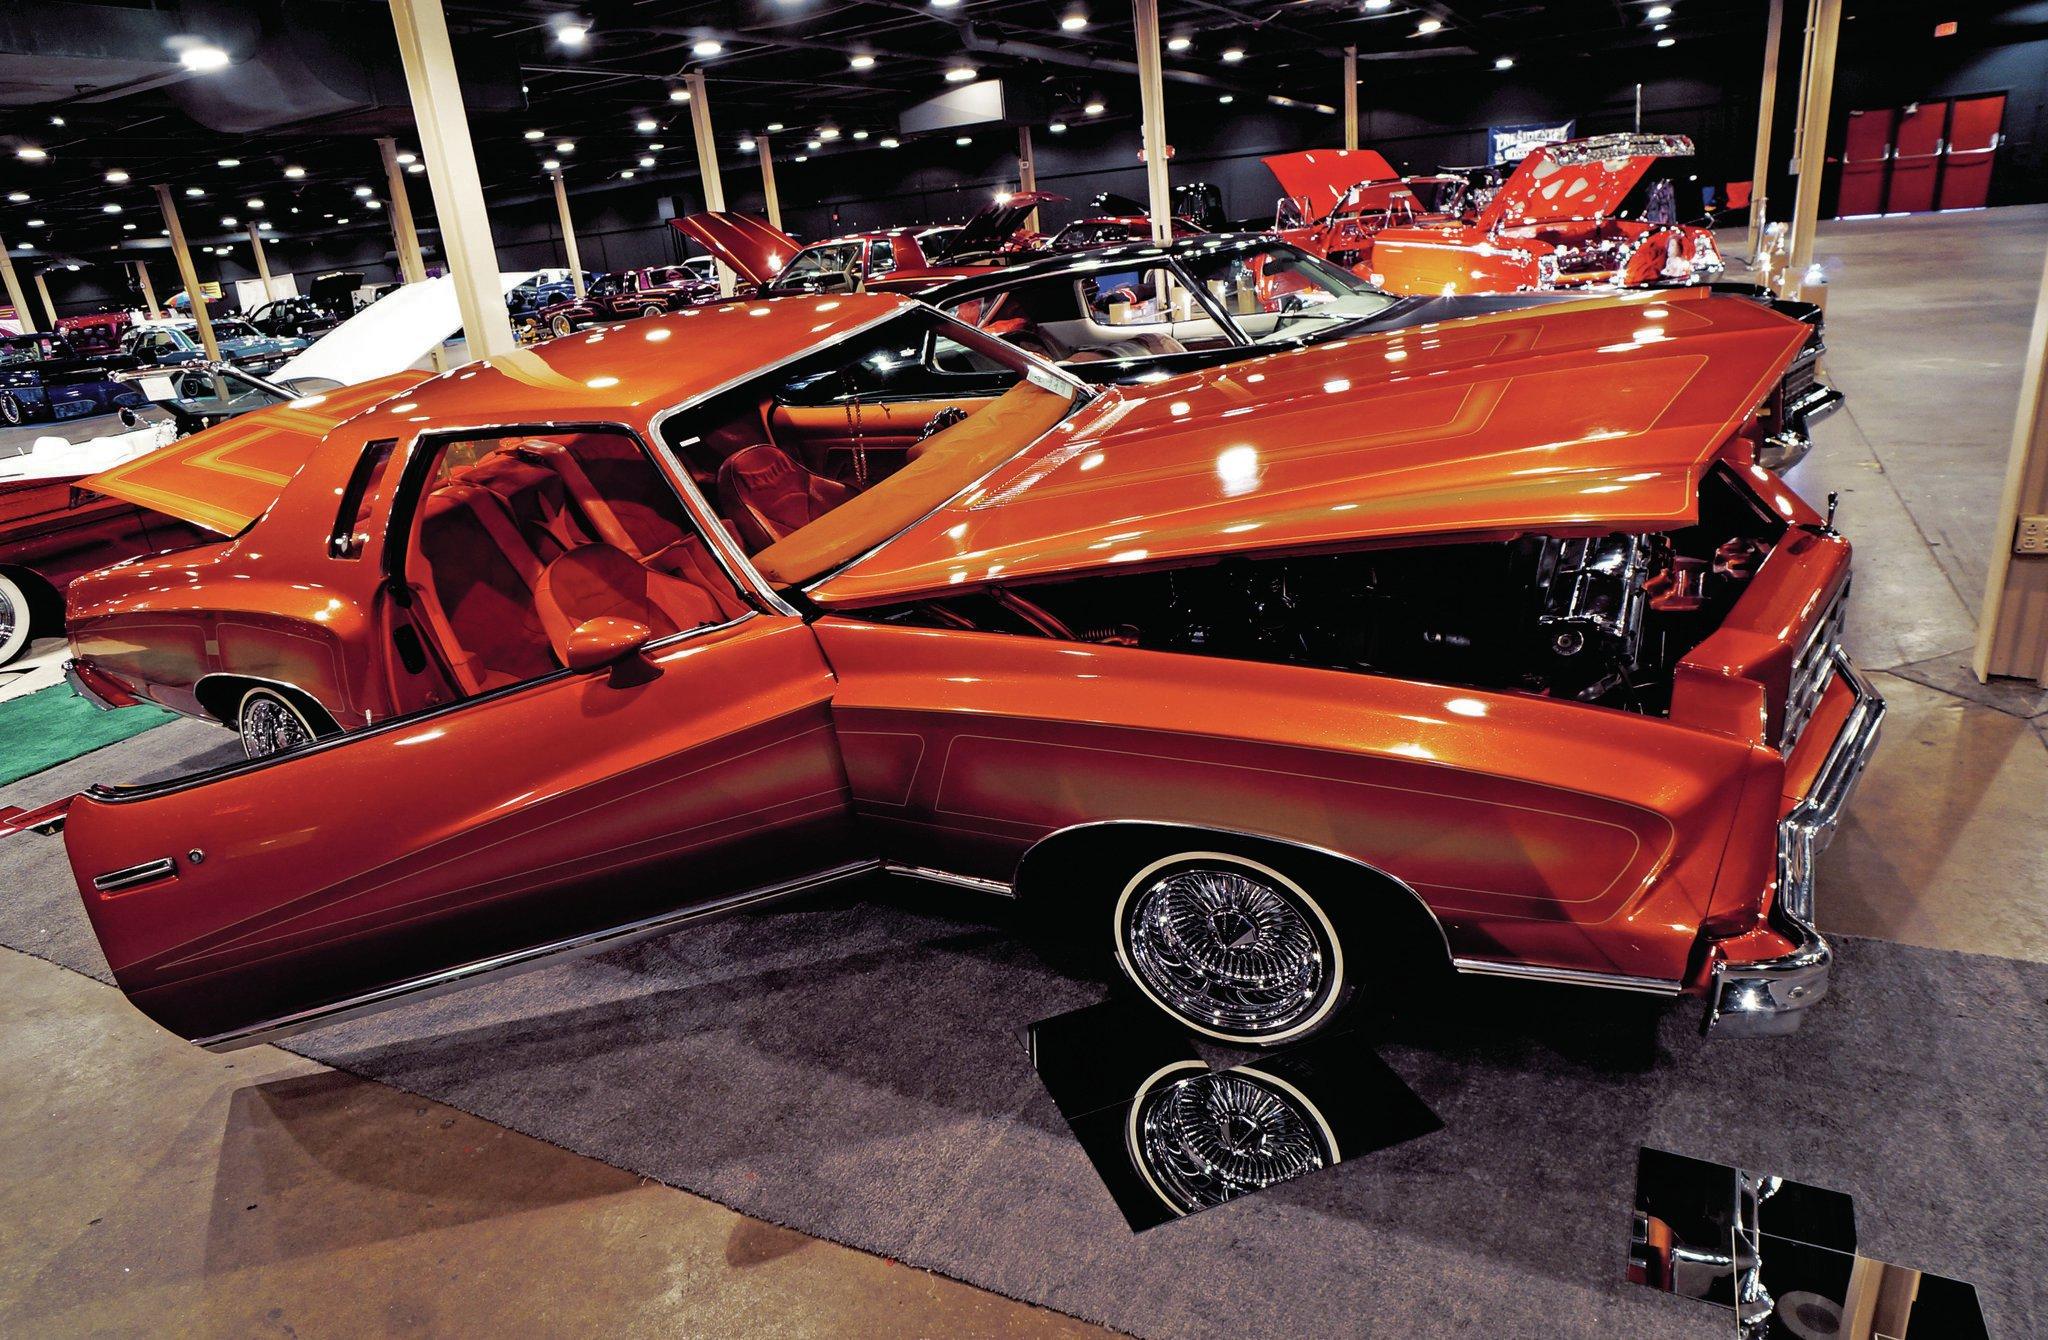 Dallas Car Show >> Jb Kustoms Lowrider Show Dallas